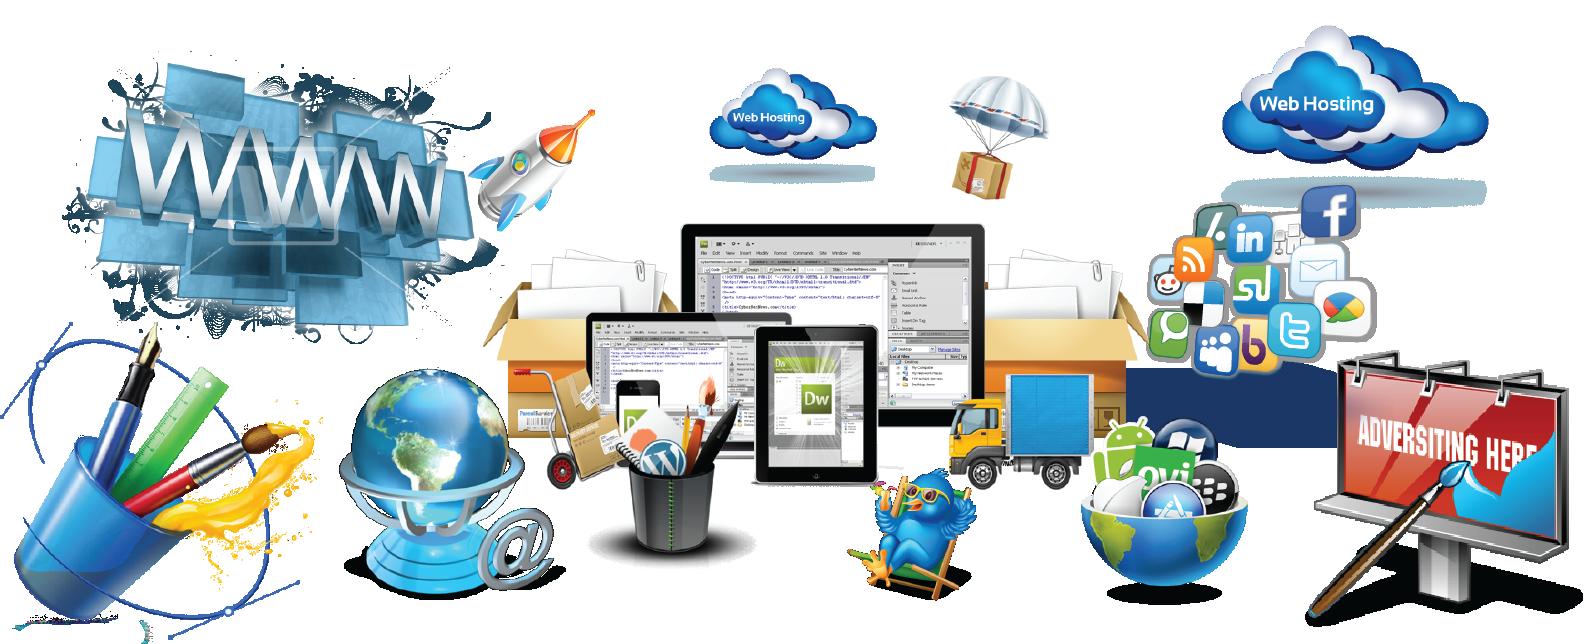 Ecommerce website design, Ecommerce website development